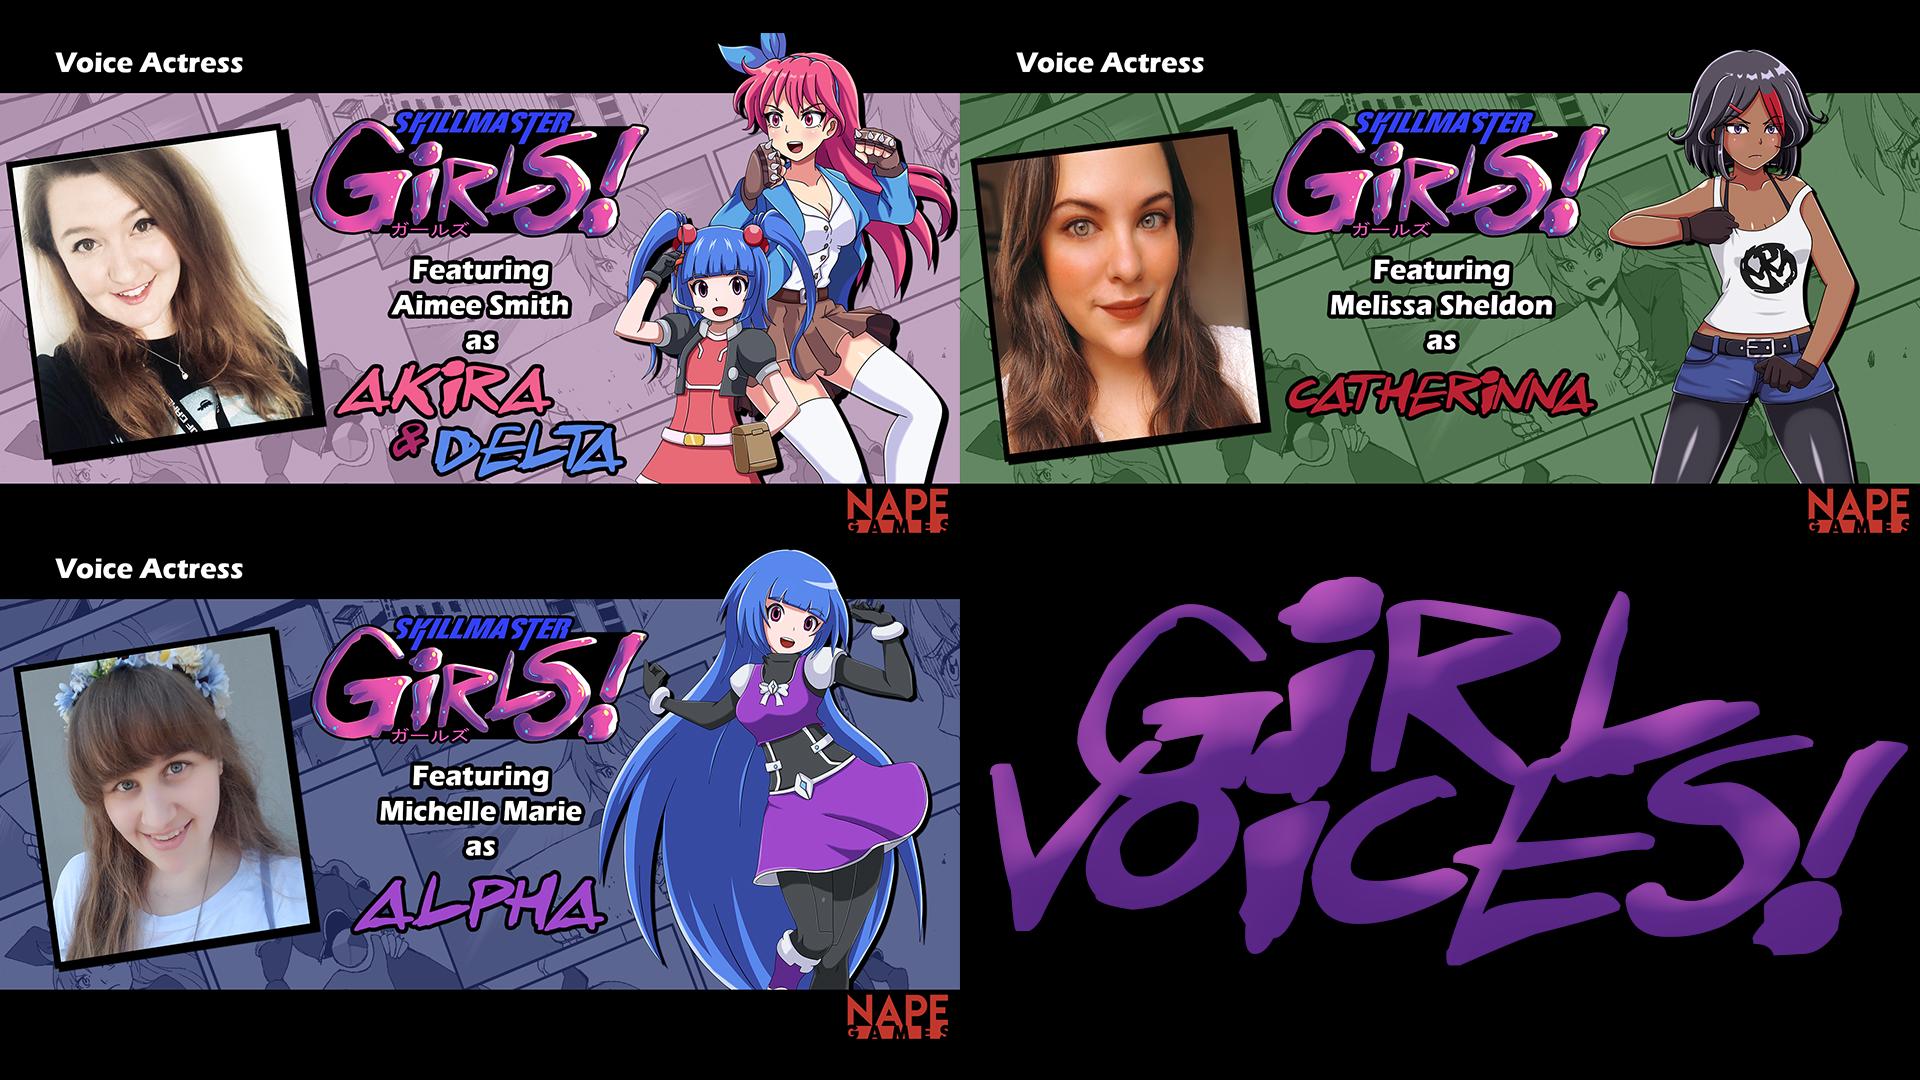 The voices behind Skillmaster Girls part 1